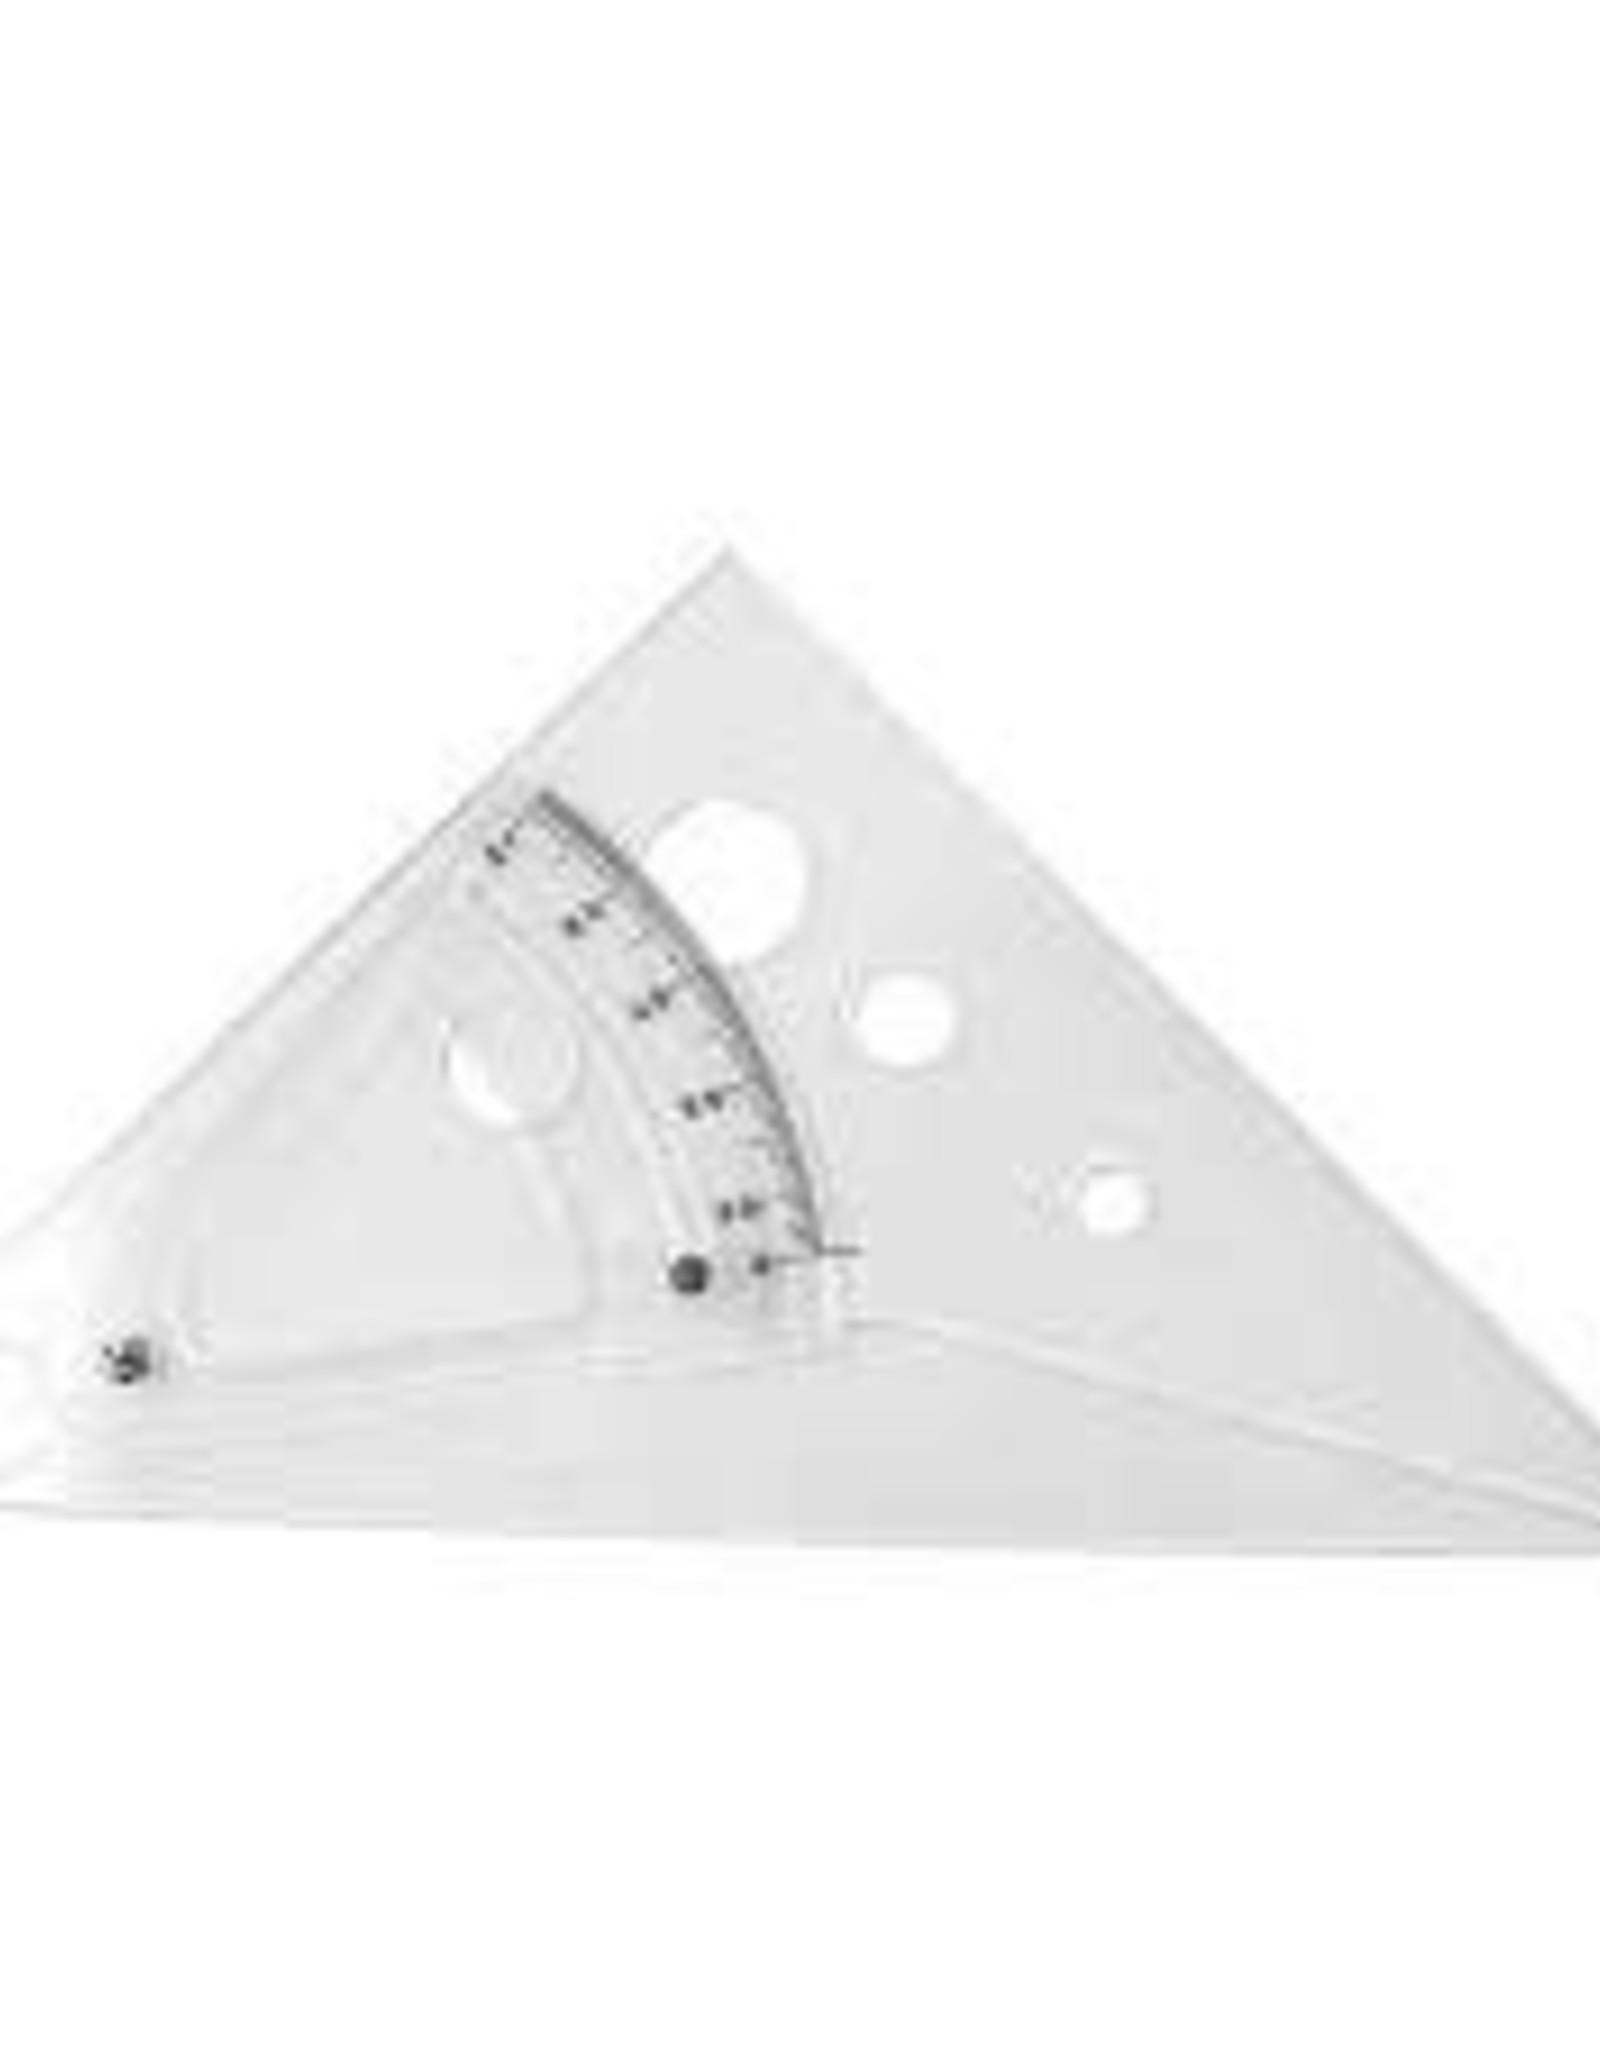 "Wescott 8"" Adjustable Triangle"